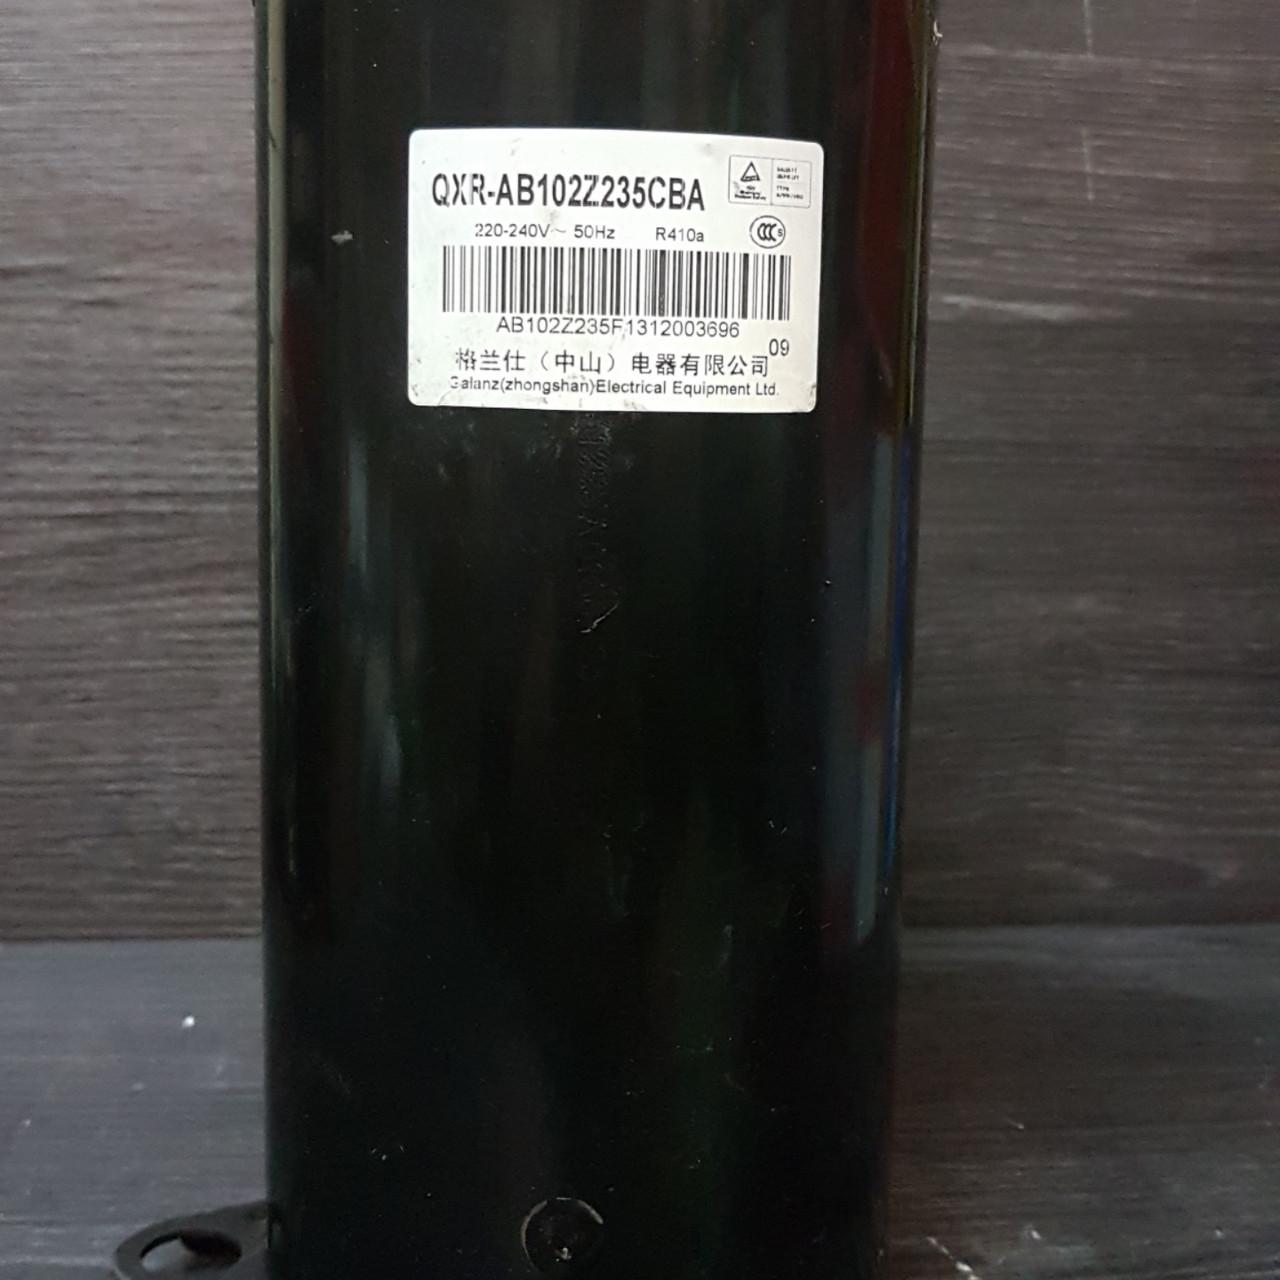 Компрессор QXR-AB102Z235CBA (9000 BTU) R-410